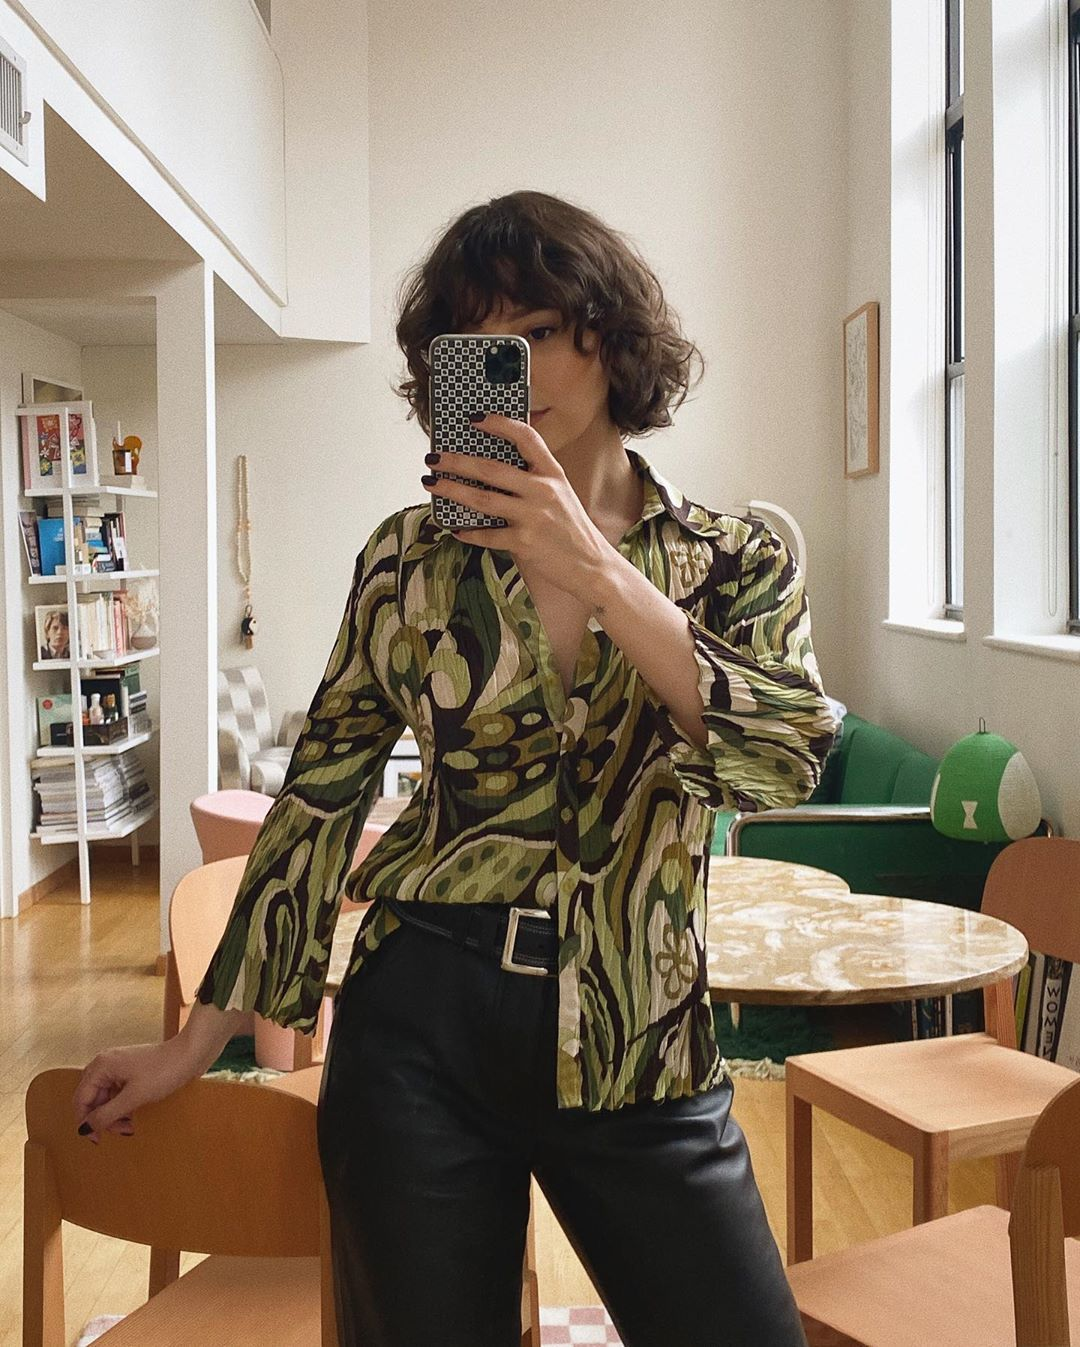 20 Wardrobe Updates to Make by Age 30 4